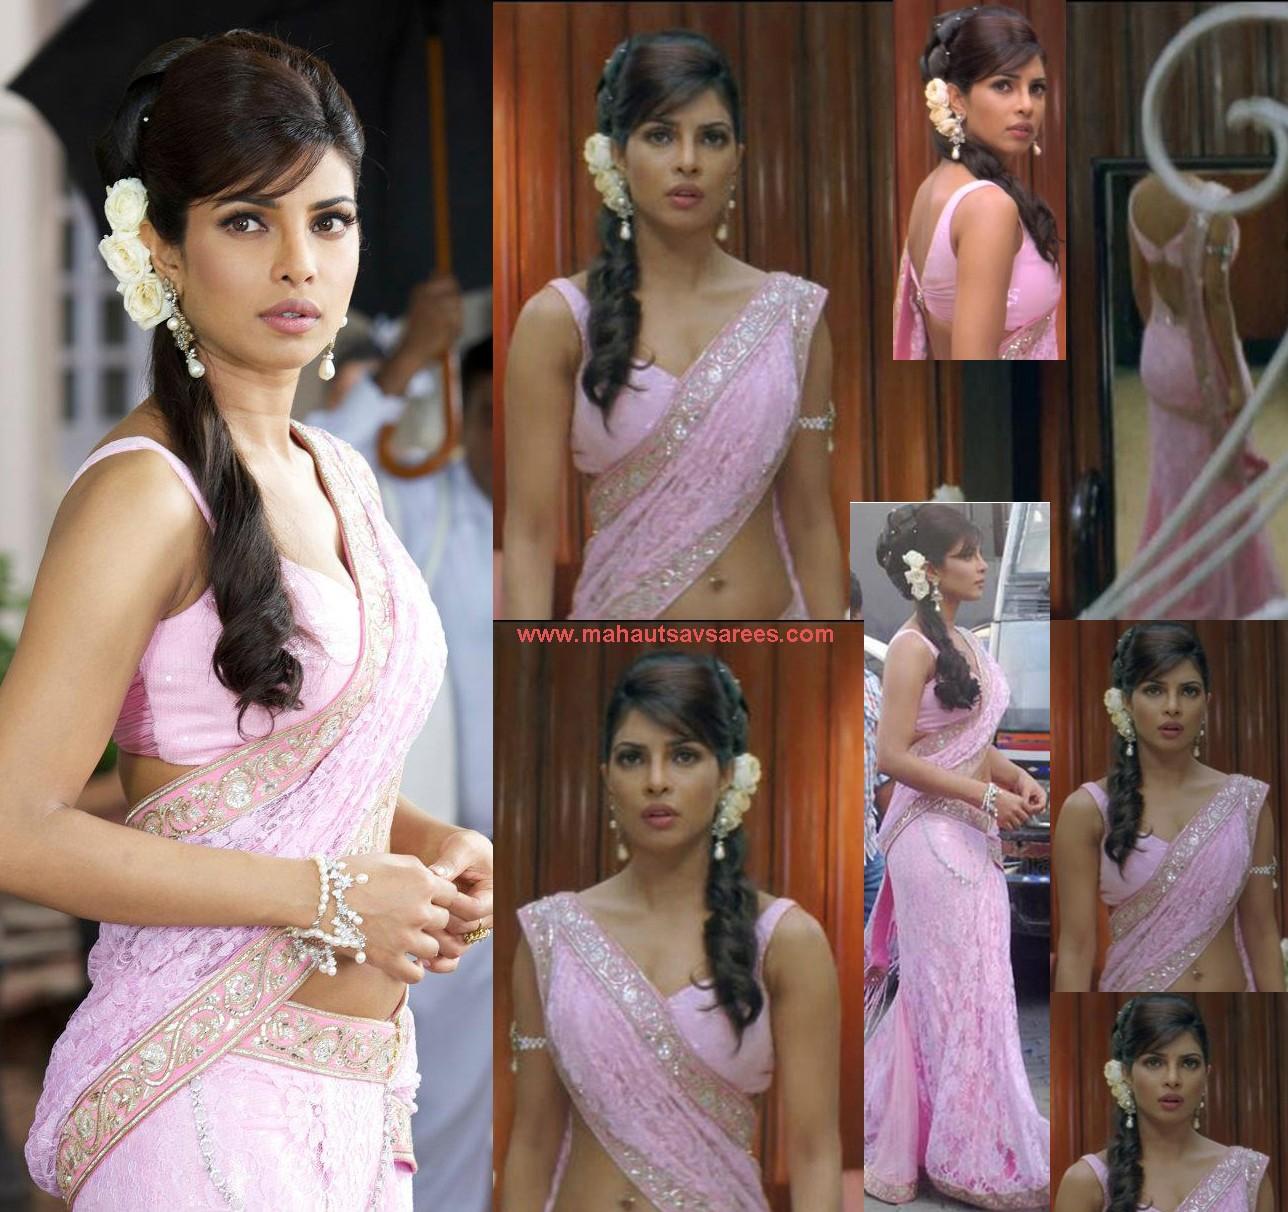 Priyanka Chopra in pink saree, Priyanka Chopra in Saree in Teri Meri Kahani Movie